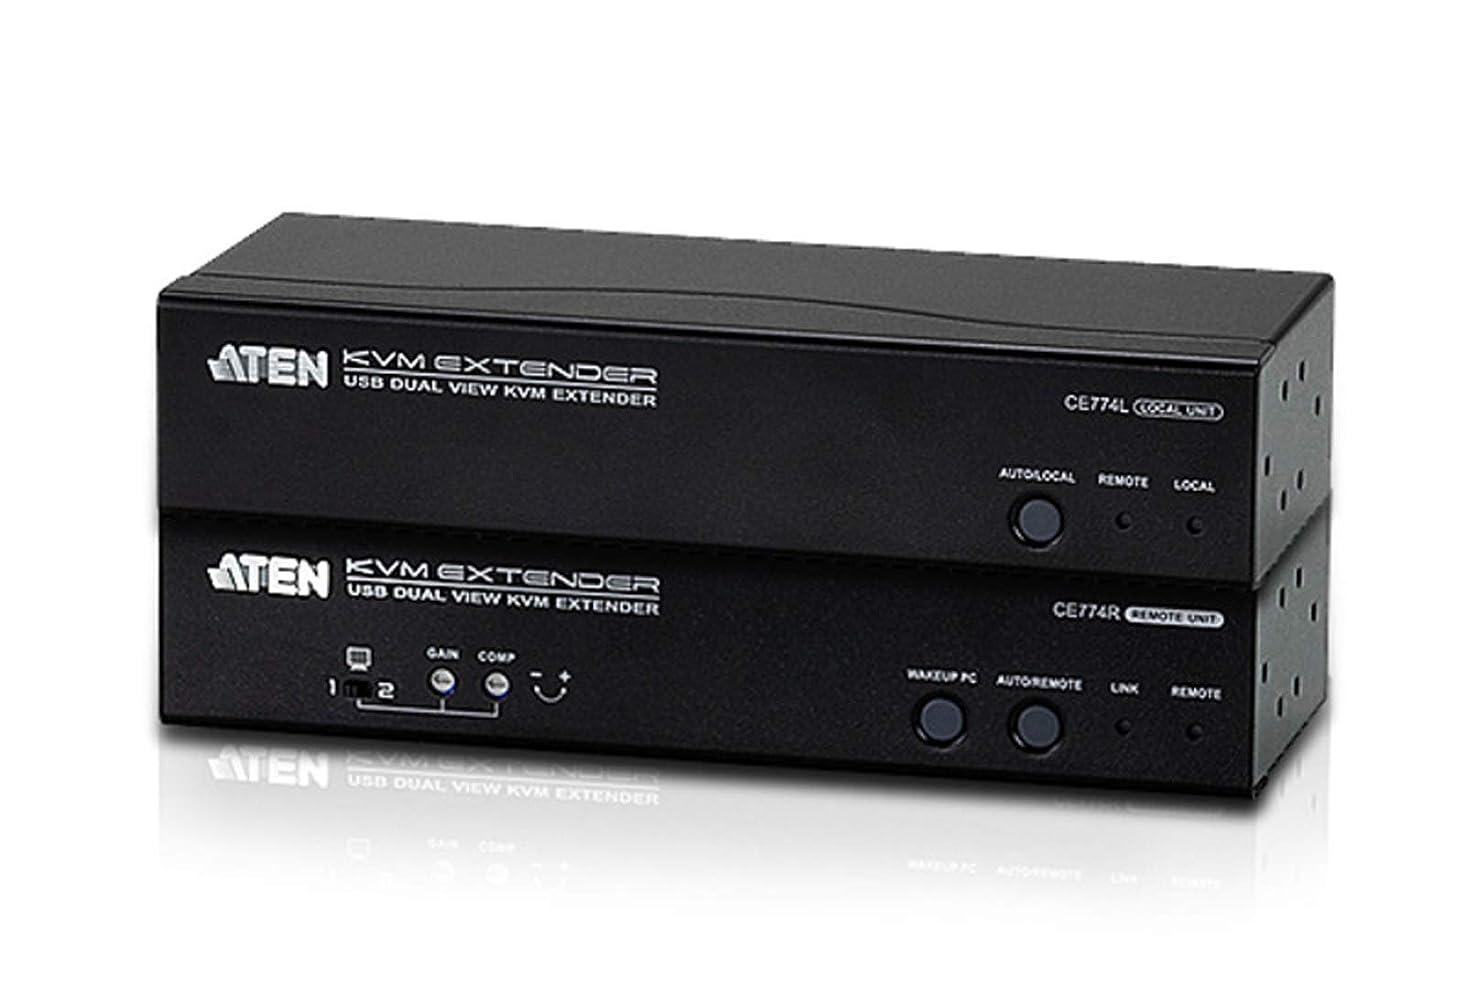 特異な周波数不正確【ATEN】【CE774】USB Dual View KVM Extender